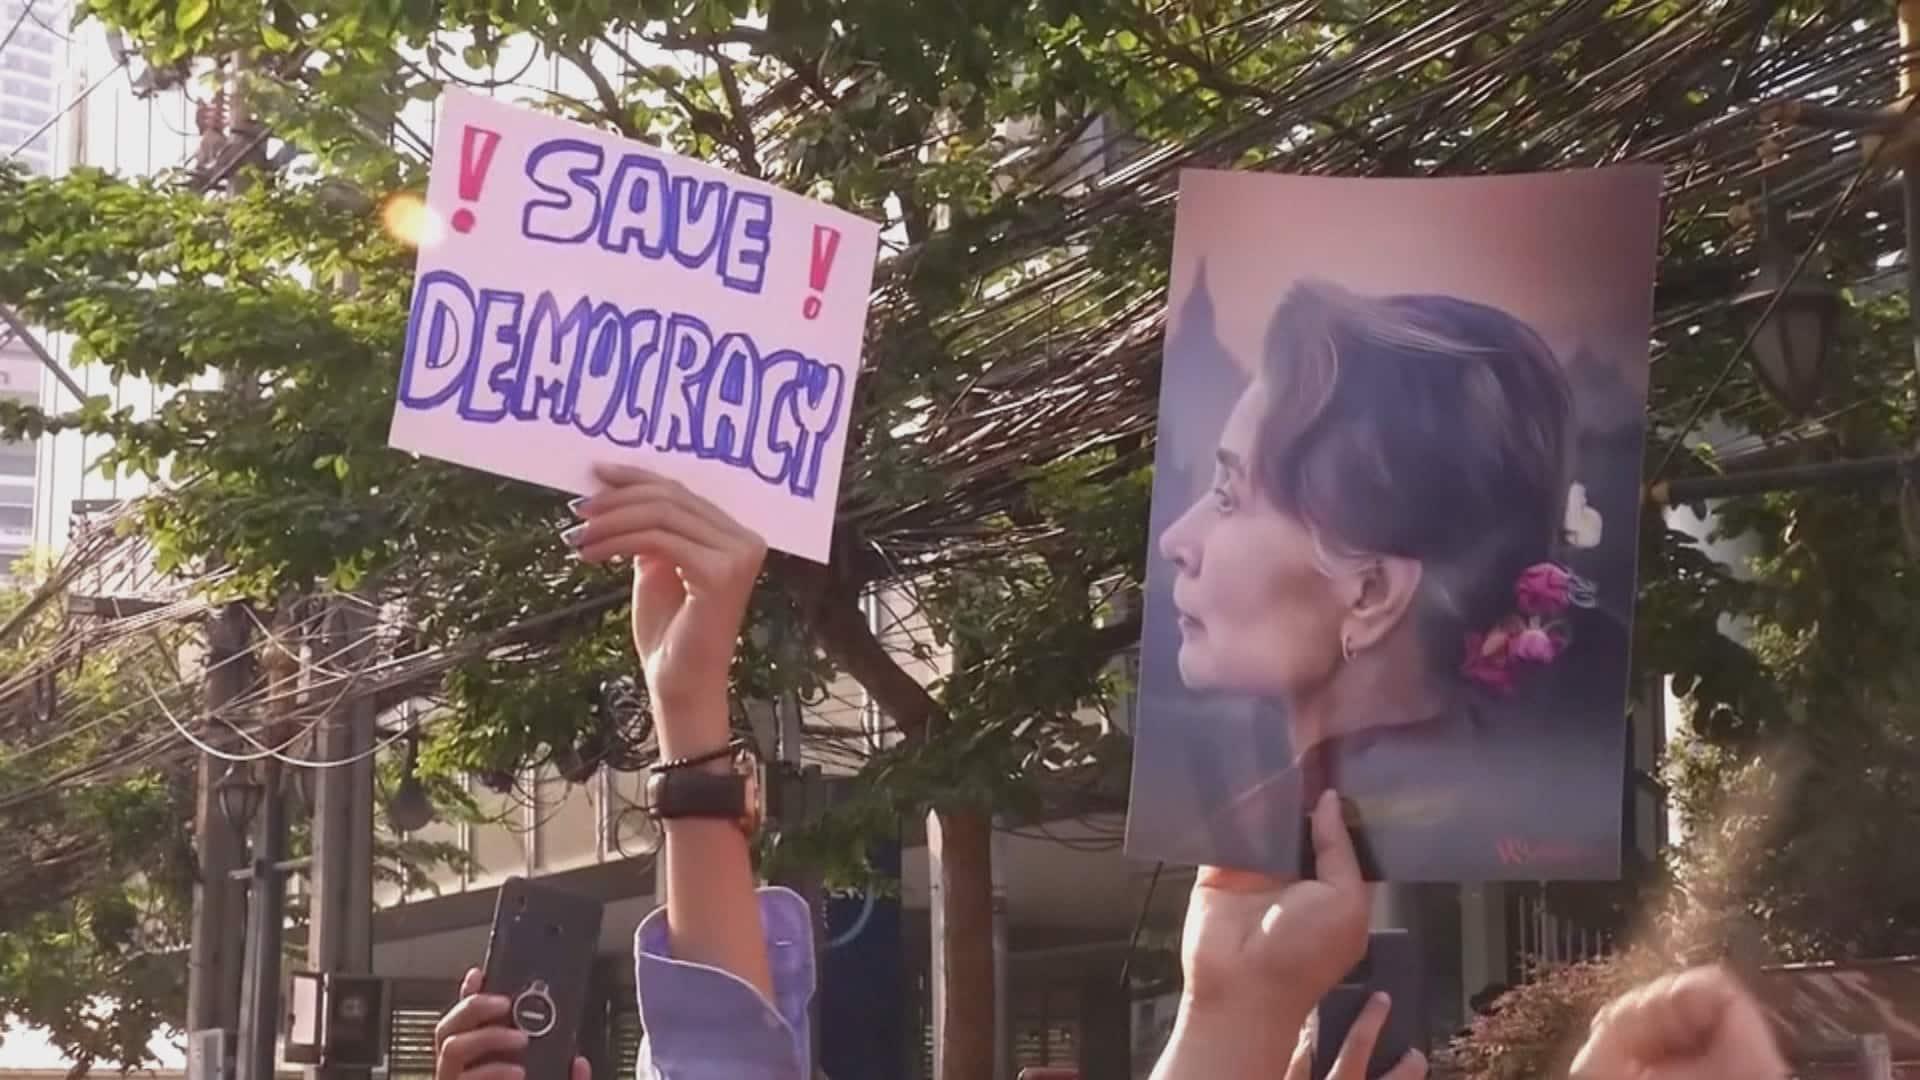 https://thumbnails.cbc.ca/maven_legacy/thumbnails/923/991/MYANMAR-COUP_frame_703.jpg